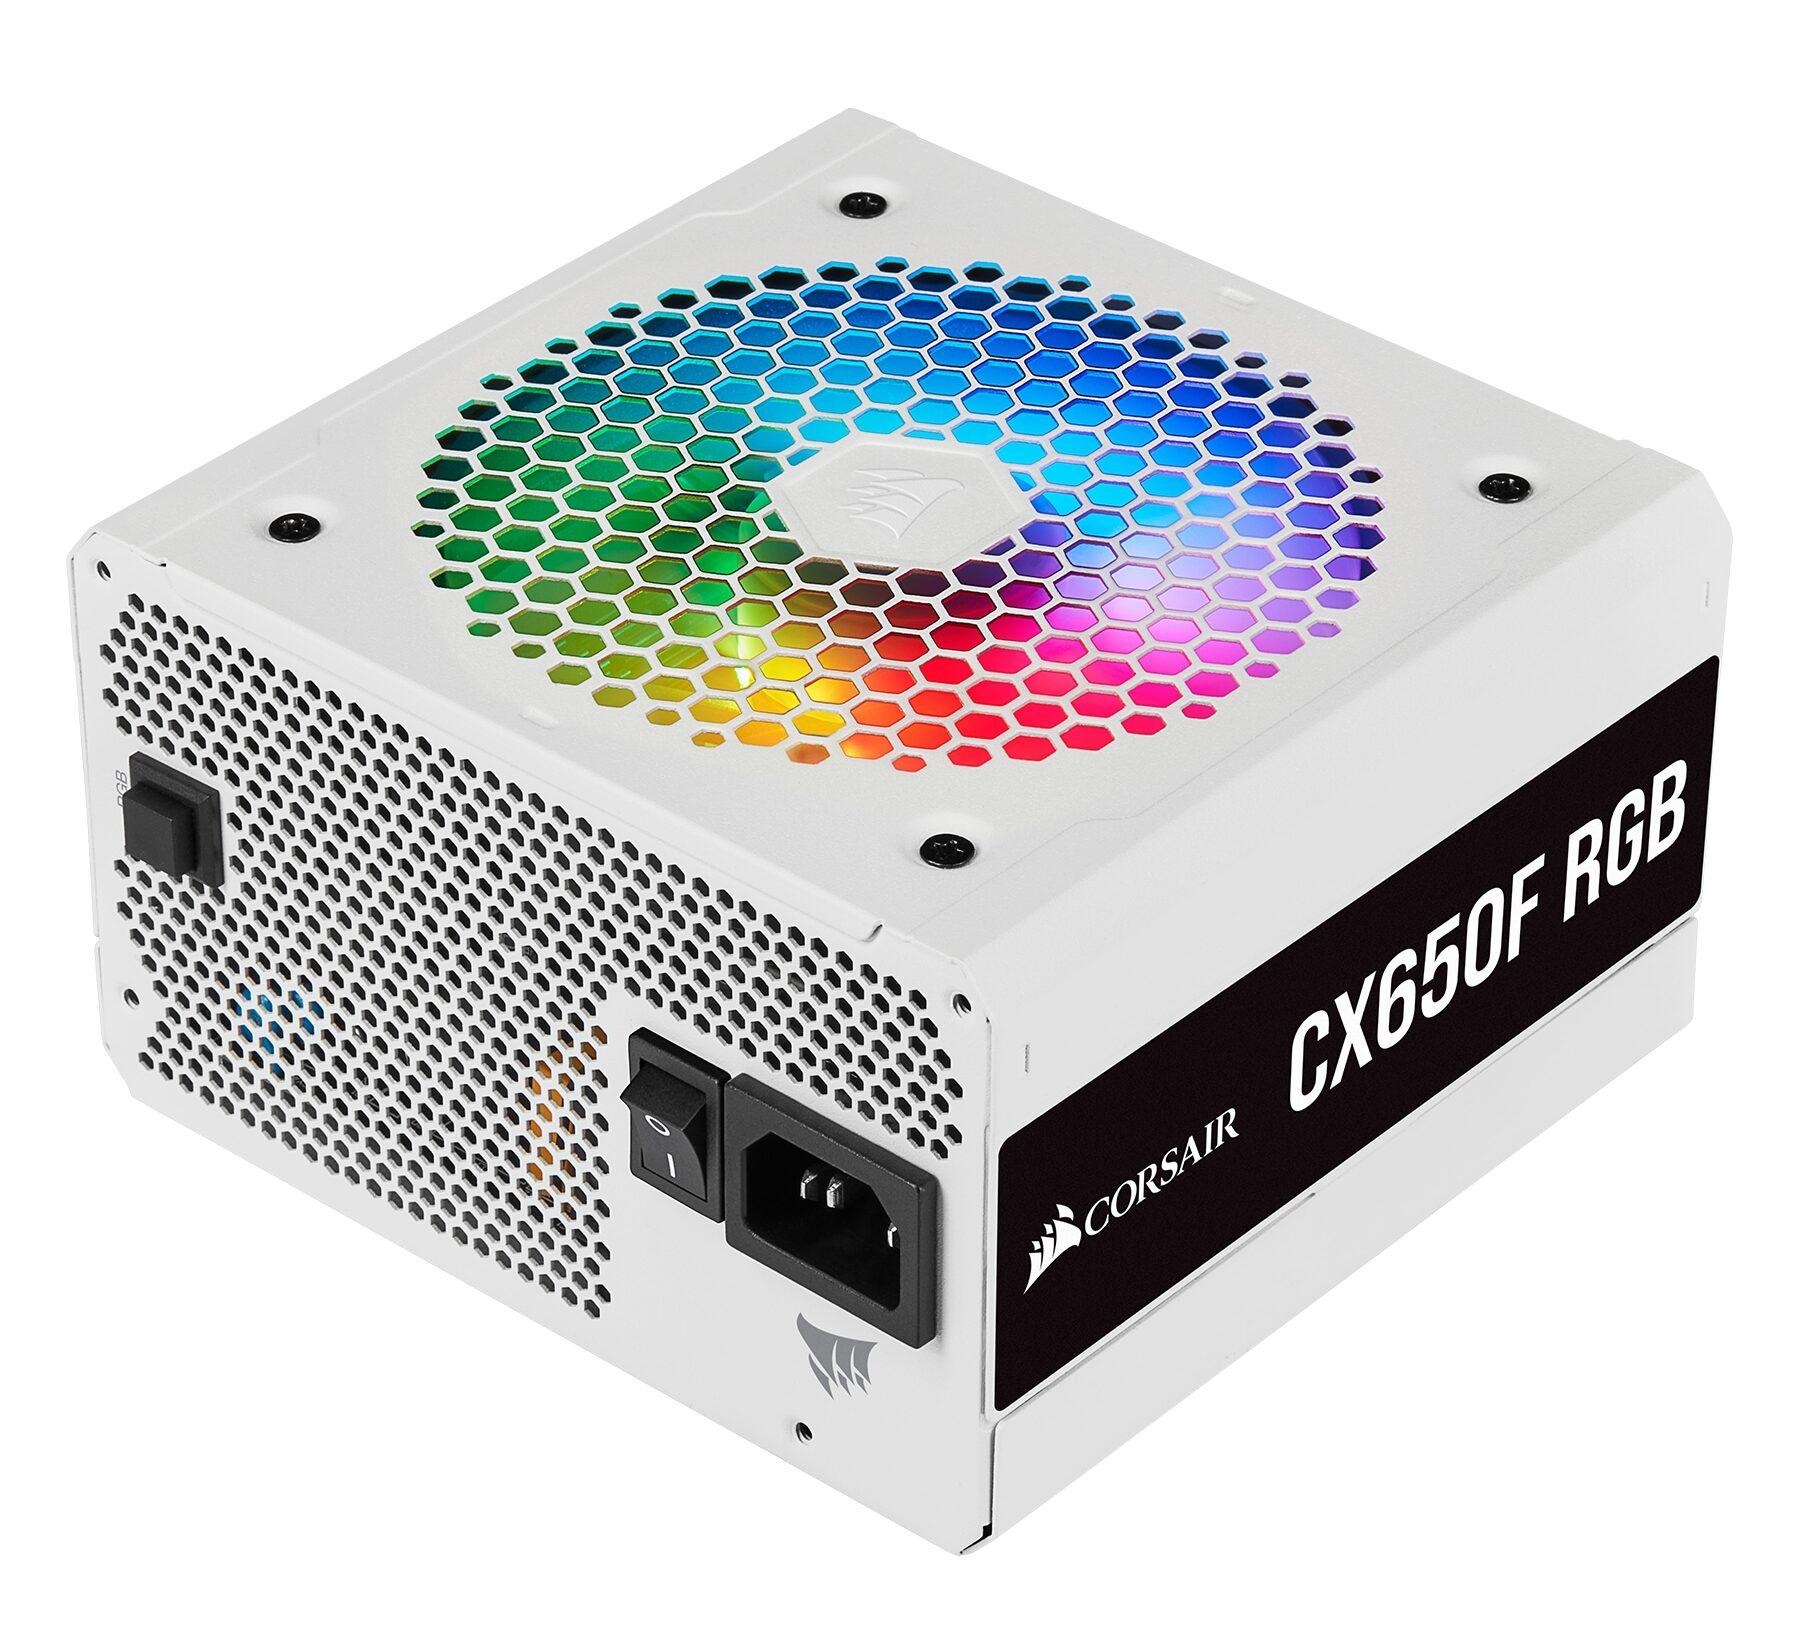 Corsair CX650F RGB